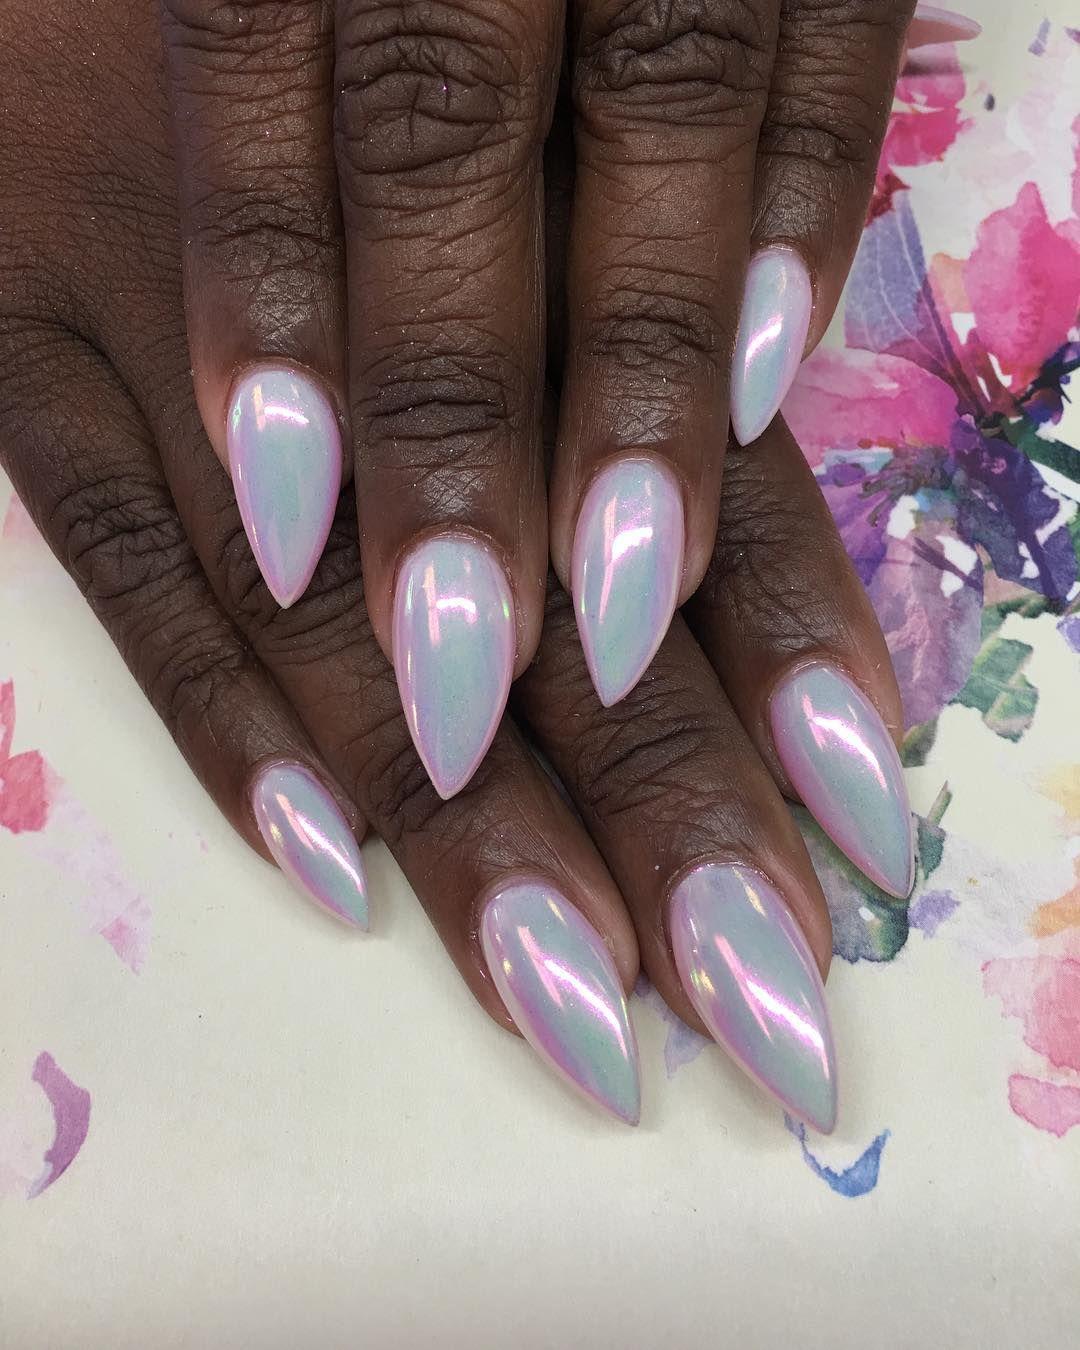 Rise And Shine Like The Unicorn Chrome Gelnails Swarovski Claws Nailart Nails Getnailed Swarovskinails Acrylics Nailitmag Modernnails Love Gelnails